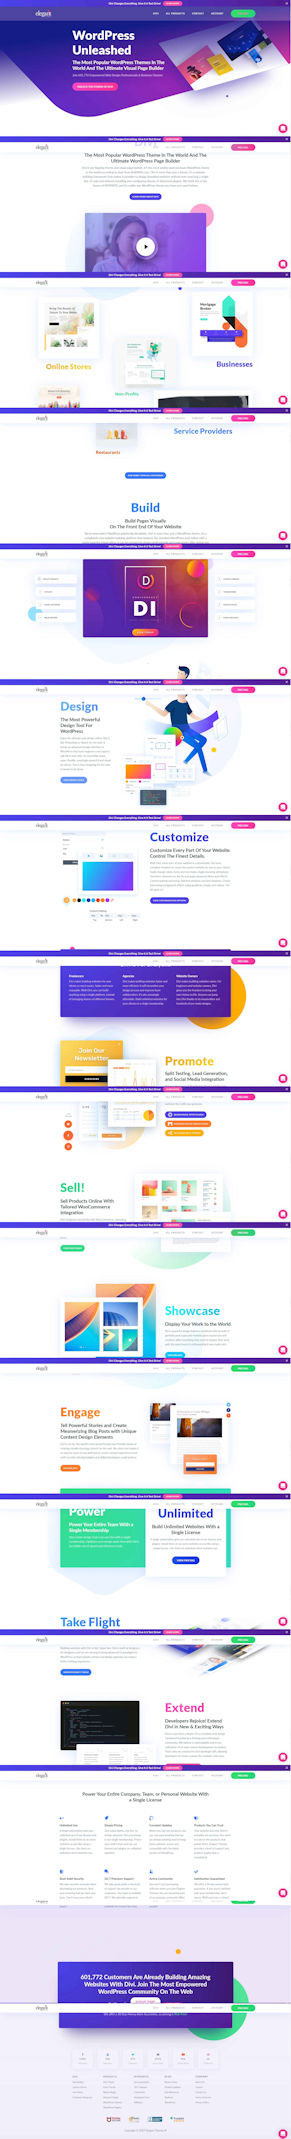 Screen capture of Elegant Themes website